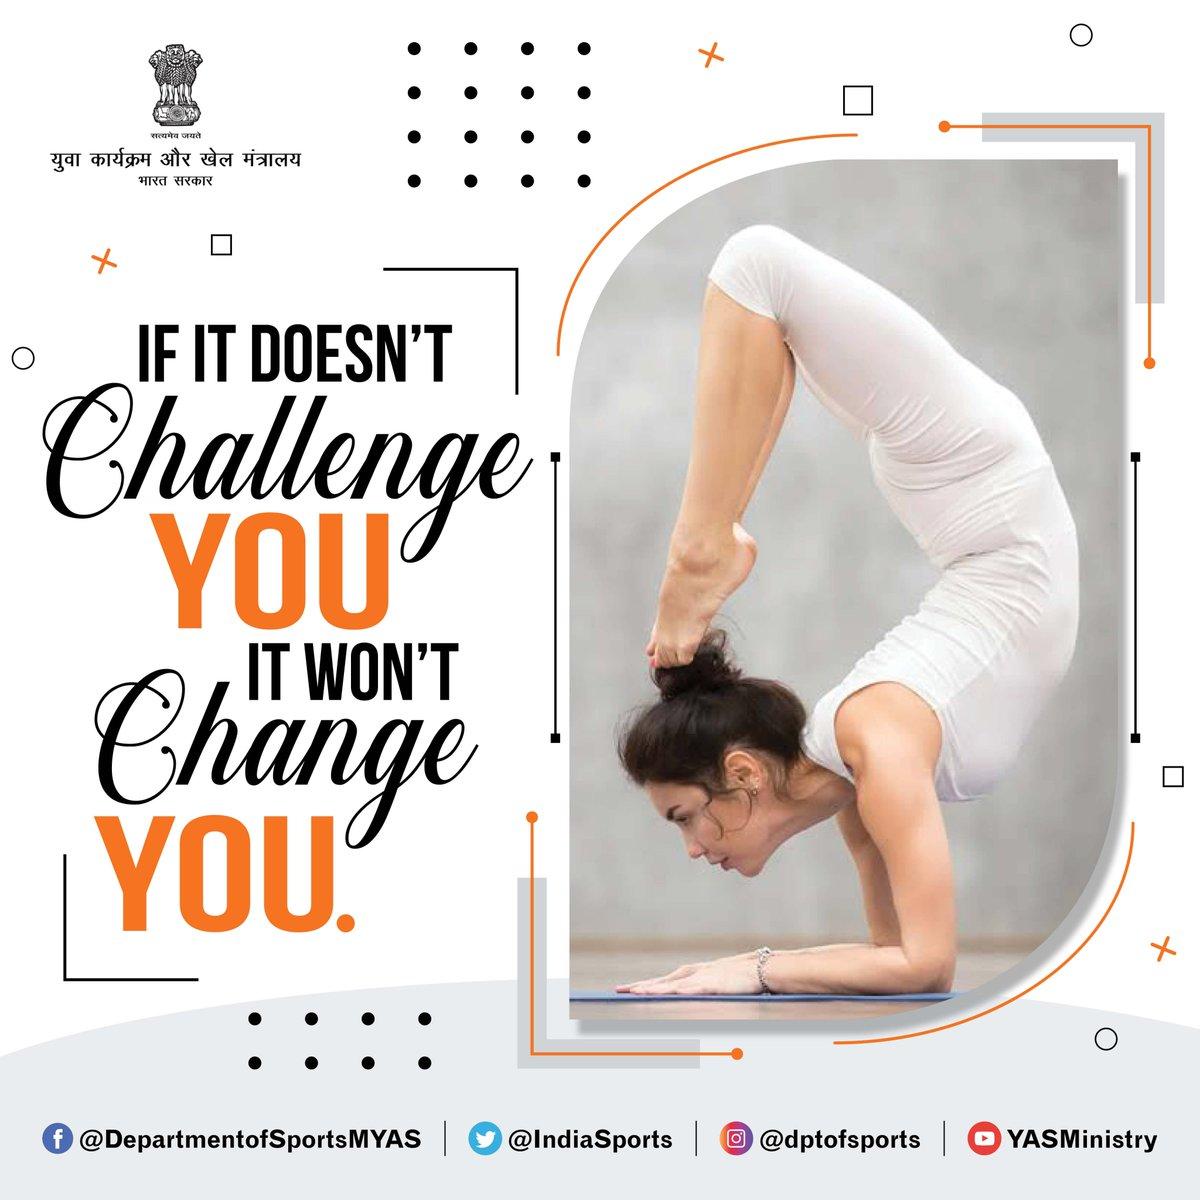 #FridayFeeling #FridayFitness #FitIndia  Challenge your limits !